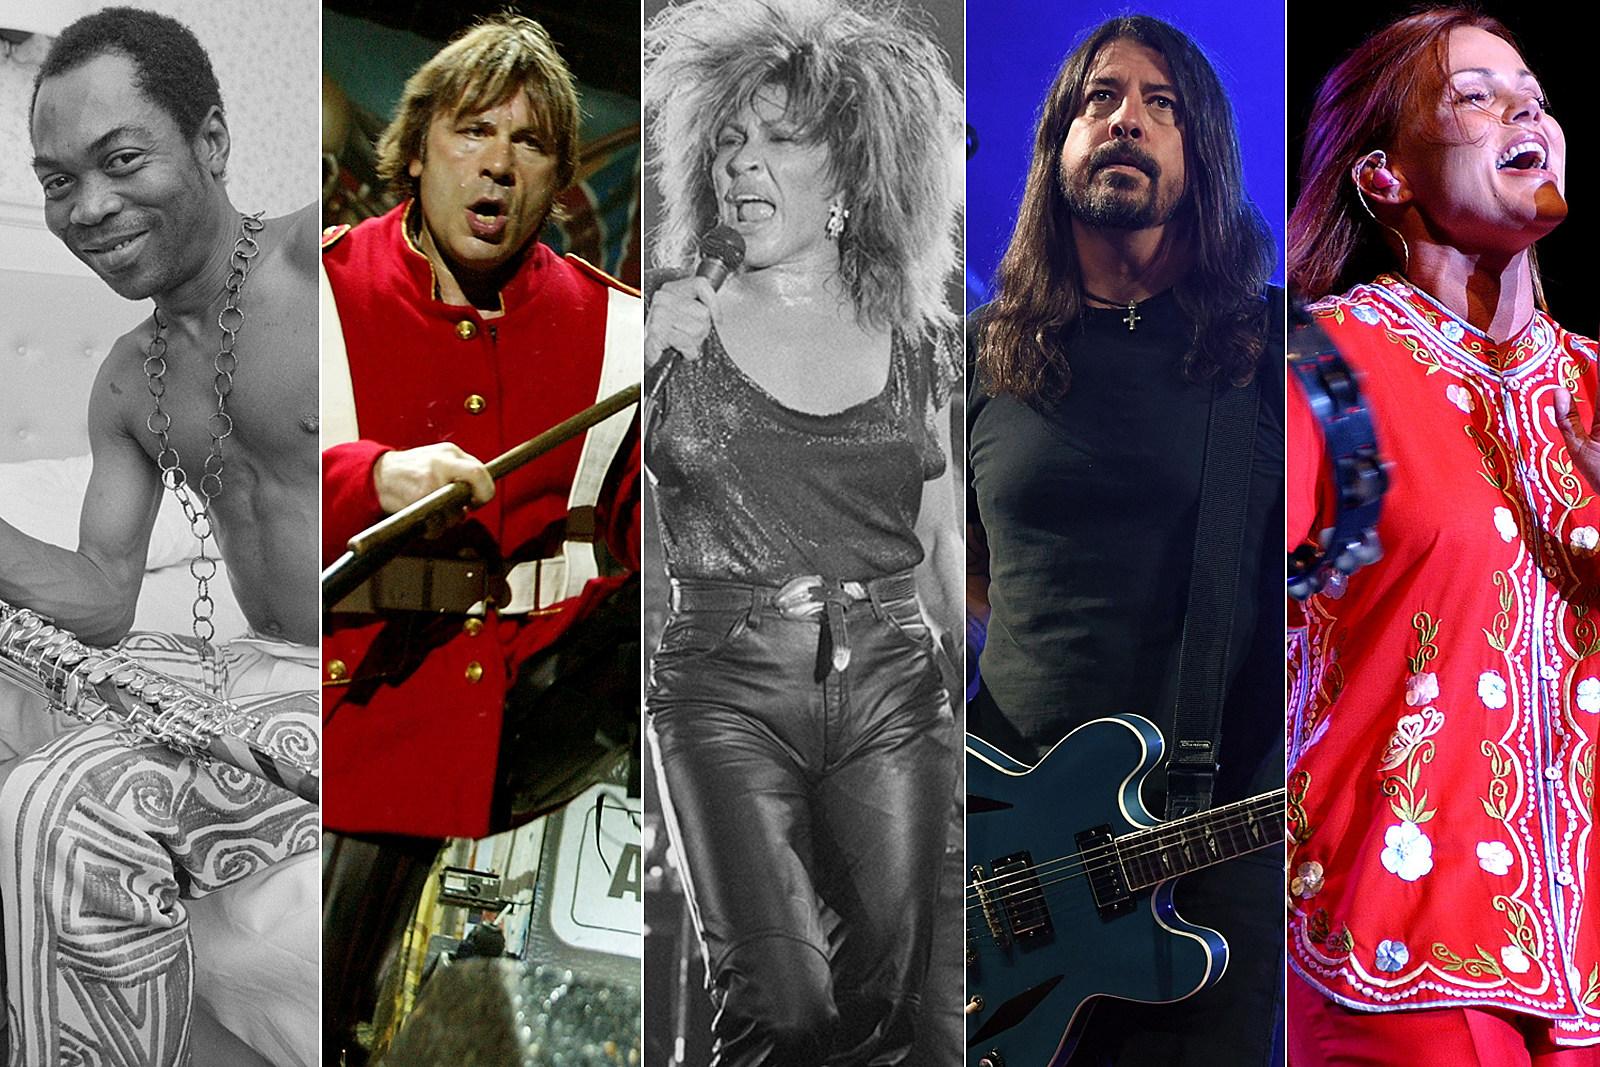 Tina Turner, Fela Kuti, Go-Go's Top Final Rock Hall Fan Ballot